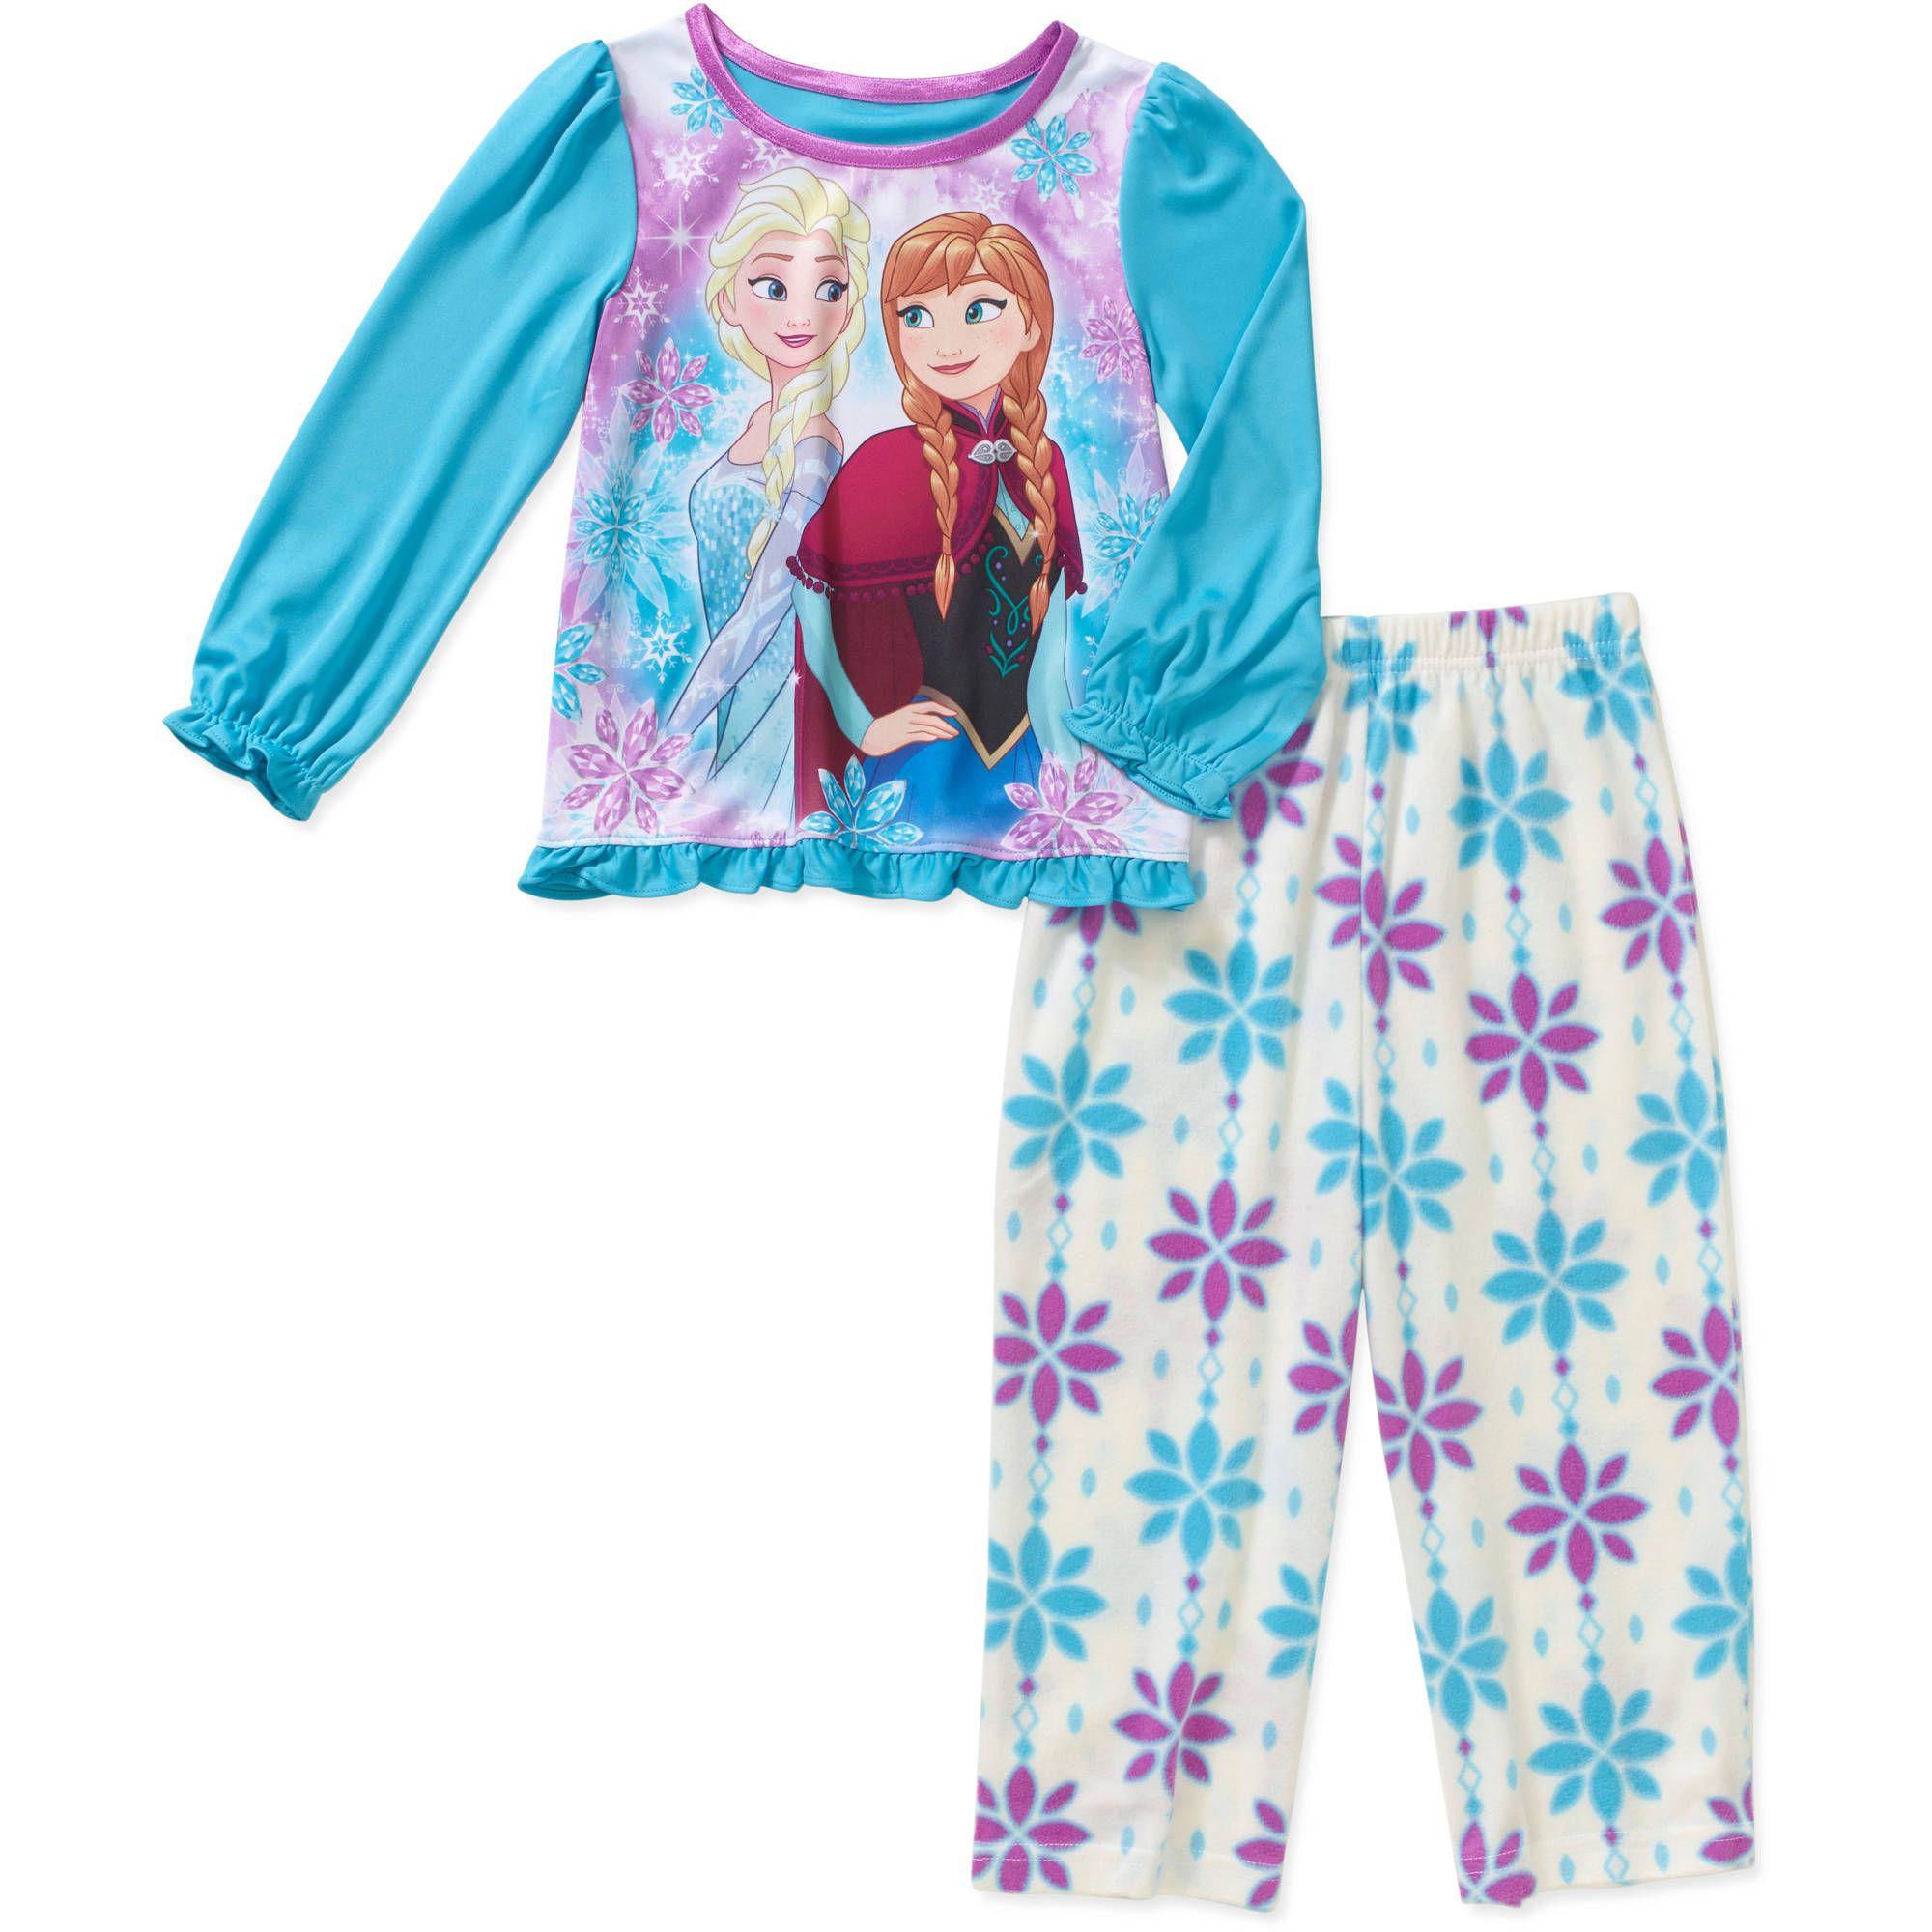 Ragazze Frozen Pigiama Bambinocongelato Set PigiamaPrincipessa Disney Elsa /& Anna Pjs